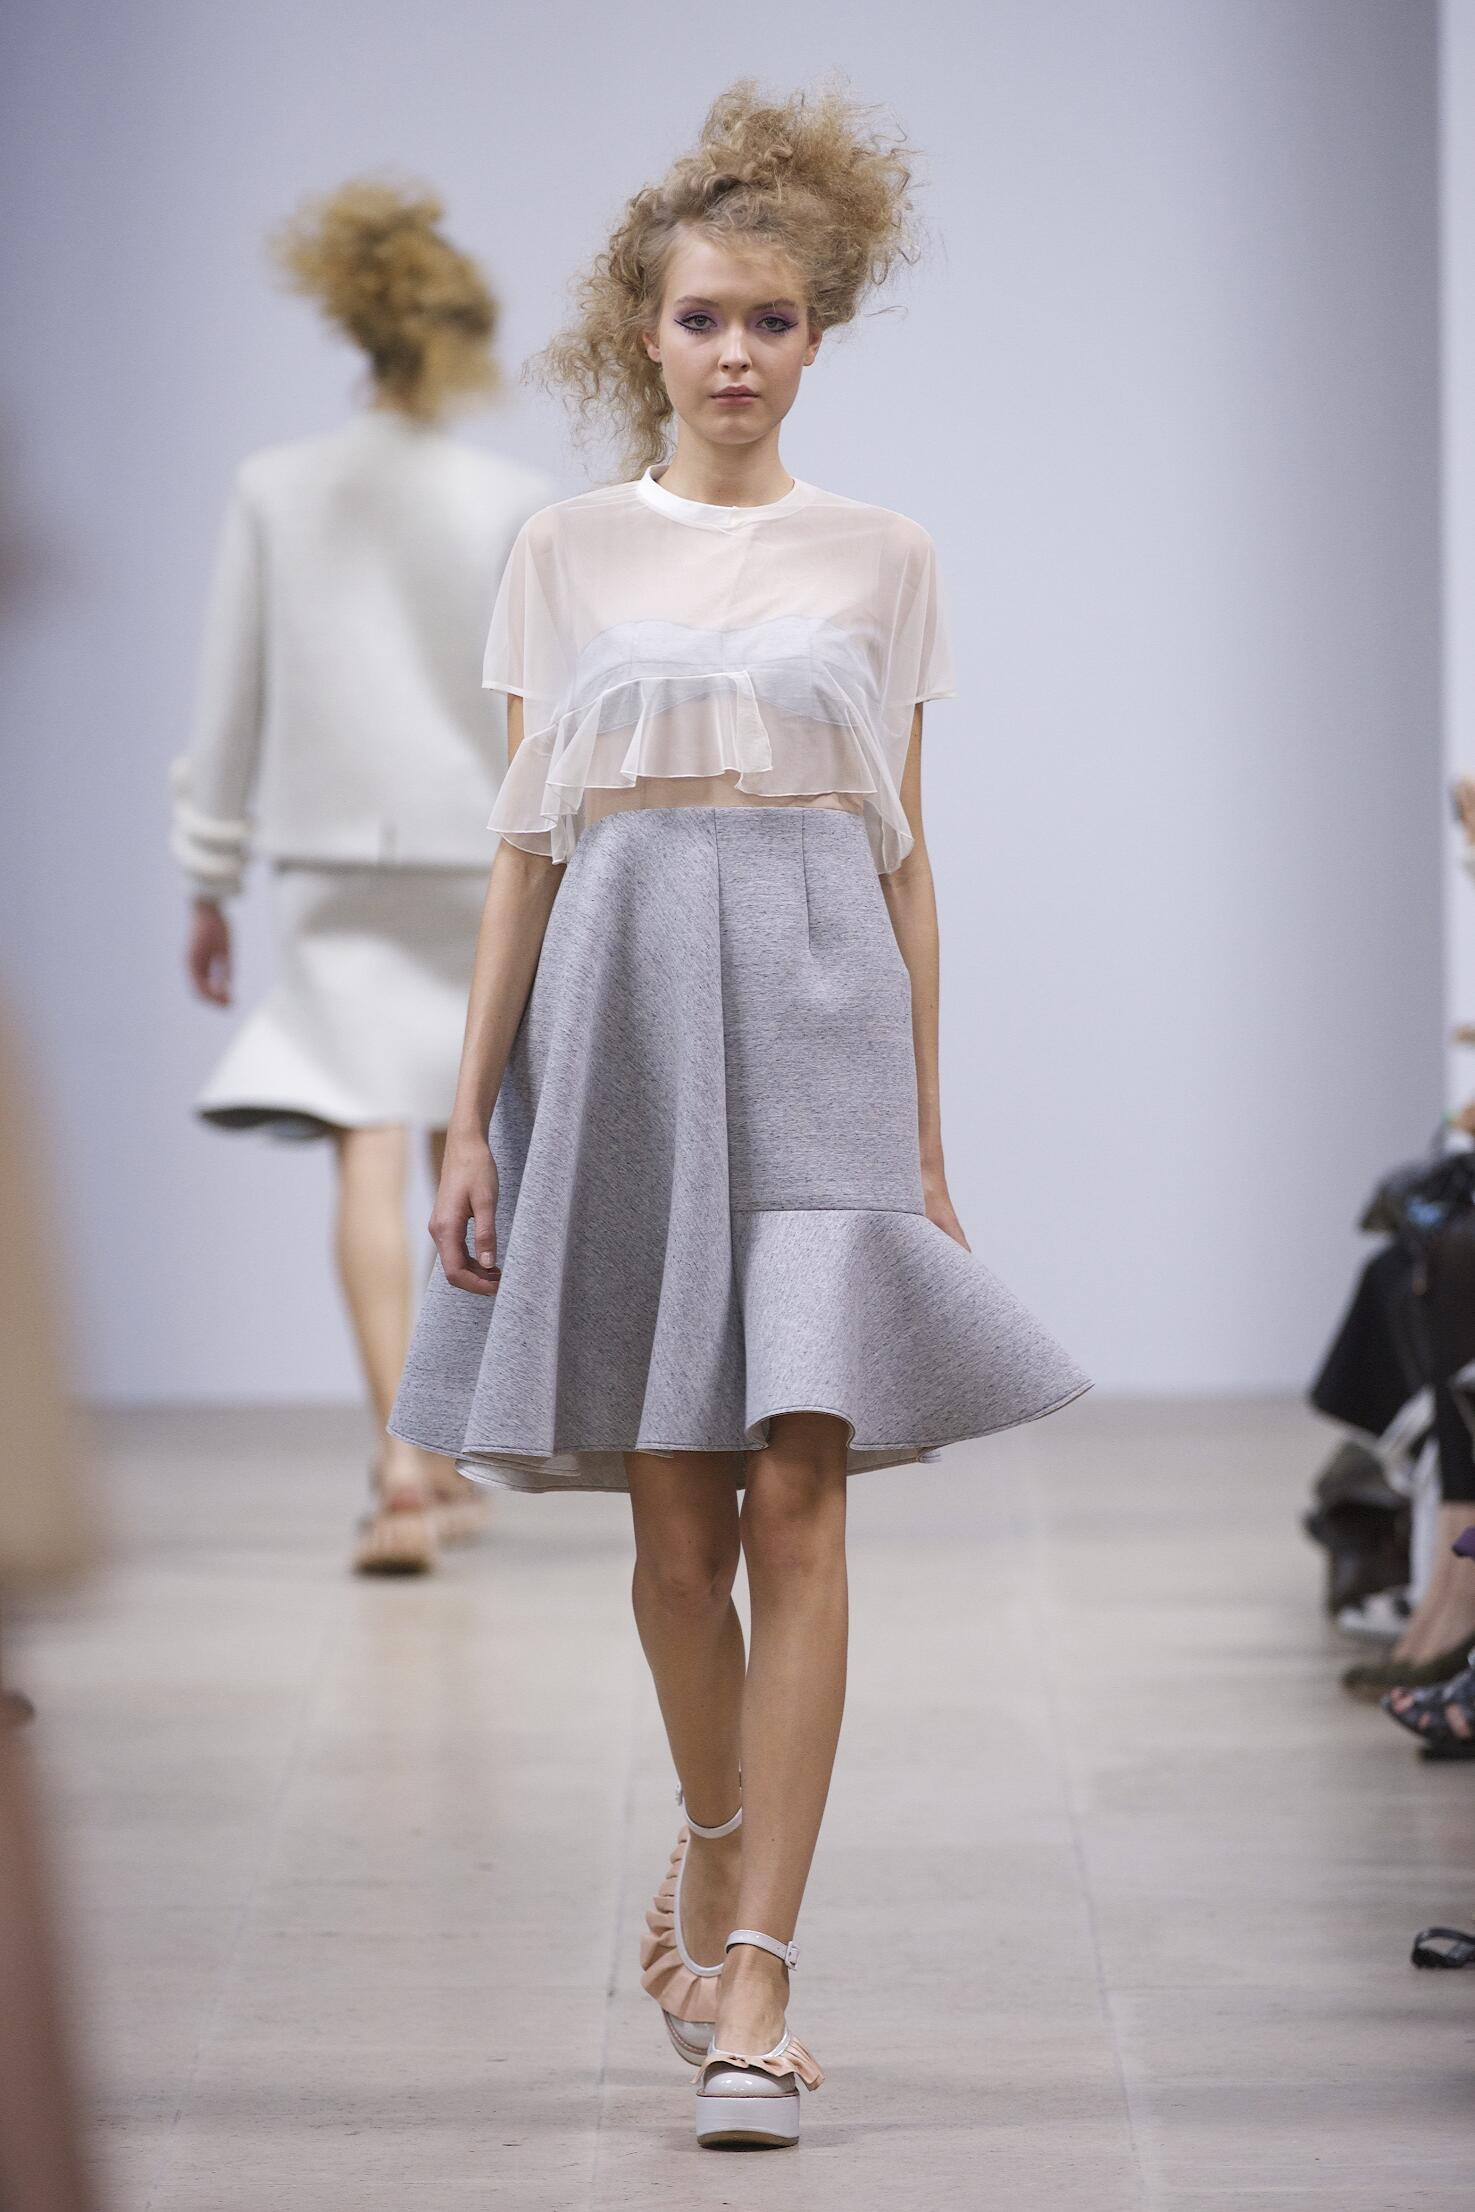 Summer 2015 Fashion Trends Julien David